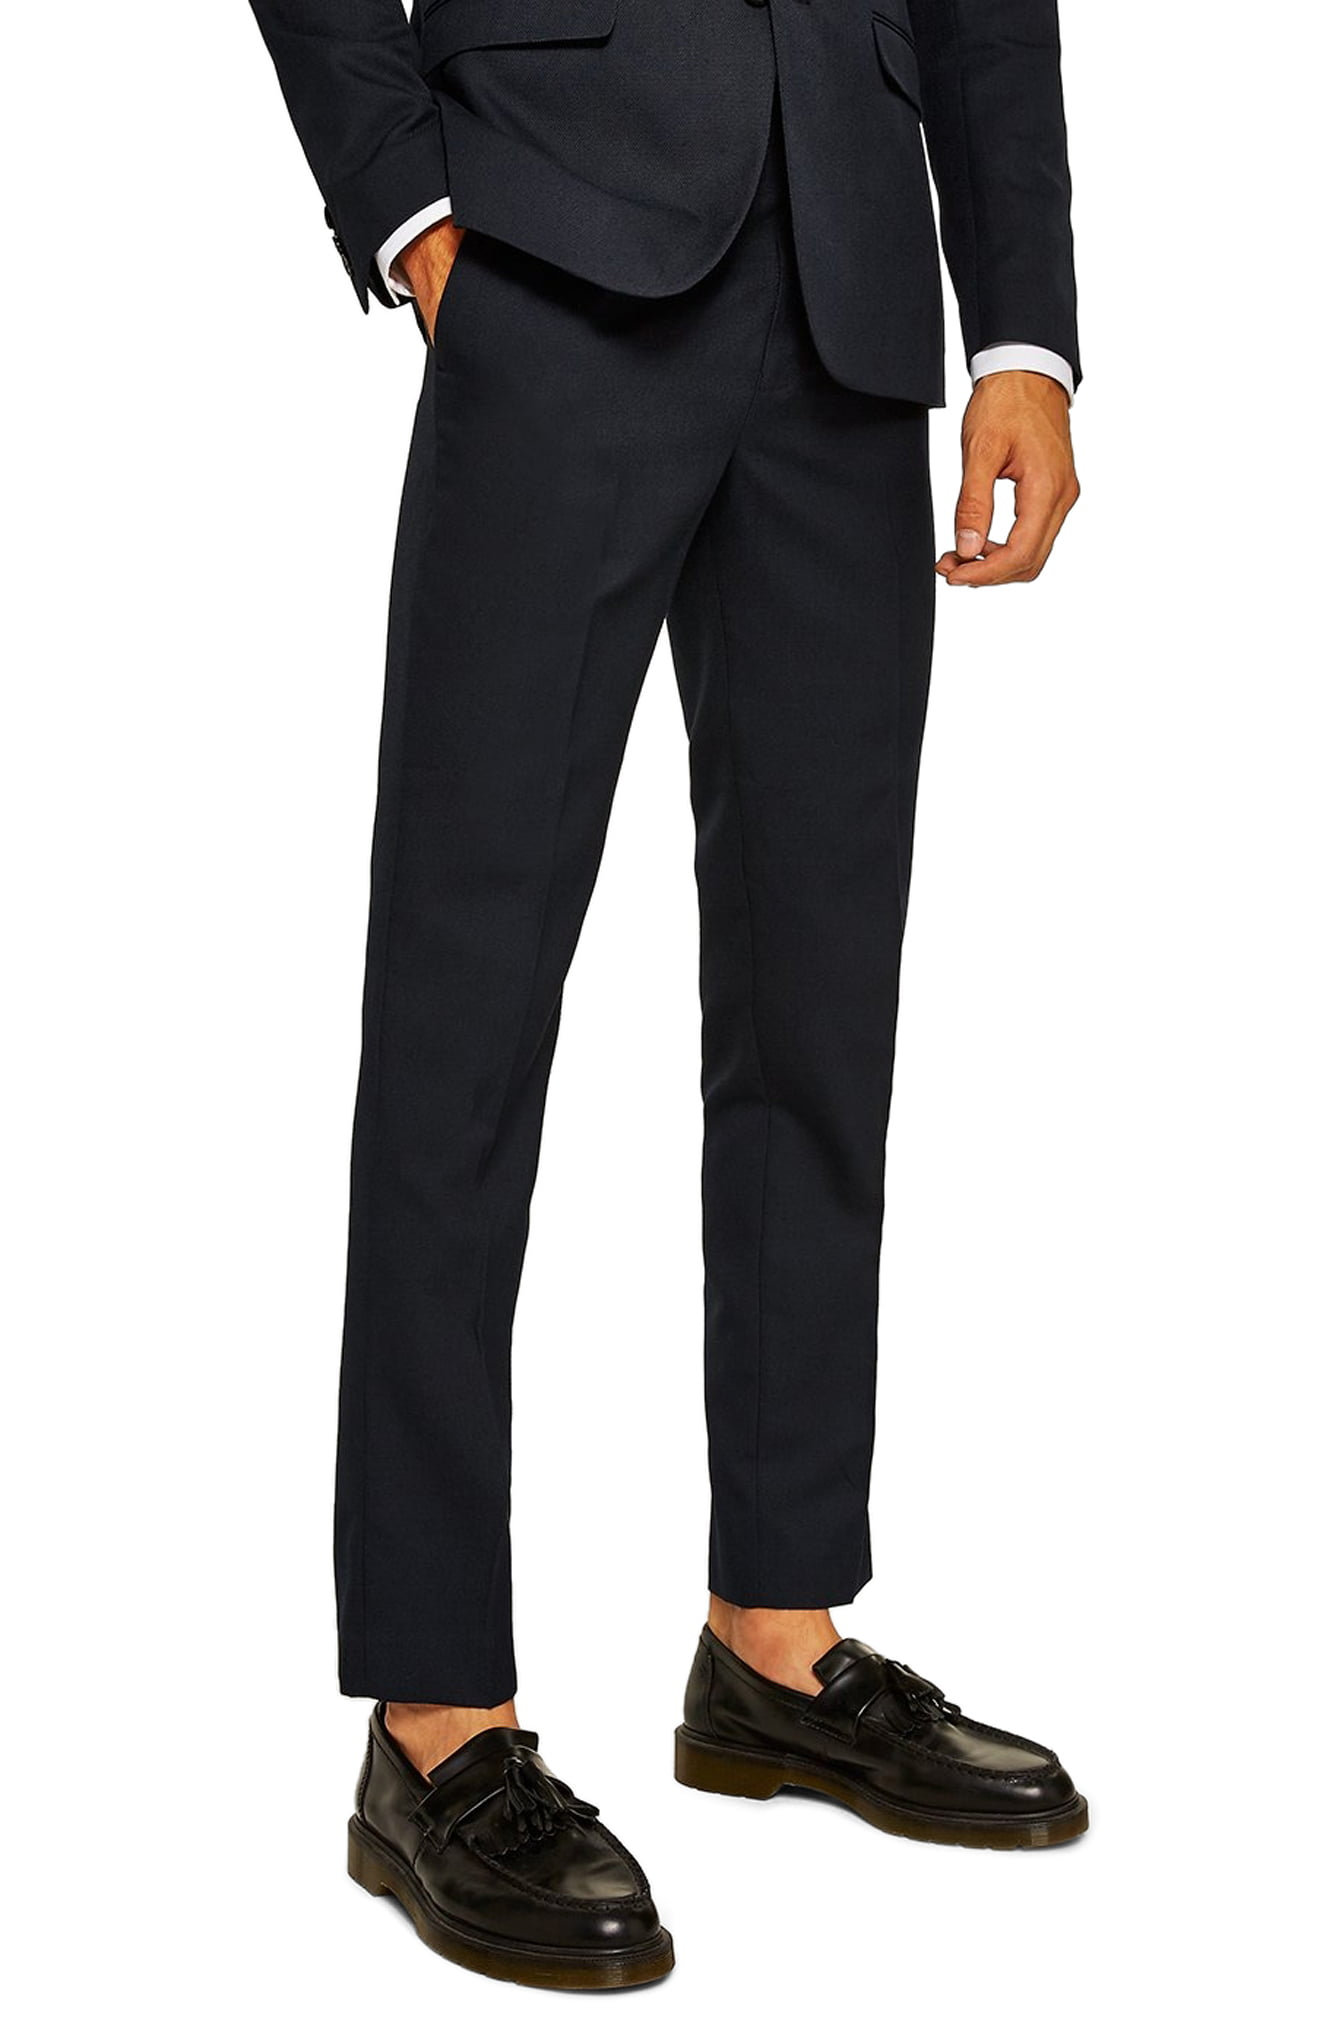 Men's Topman Skinny Fit Textured Dress Pants, Size 34 x 30 - Blue